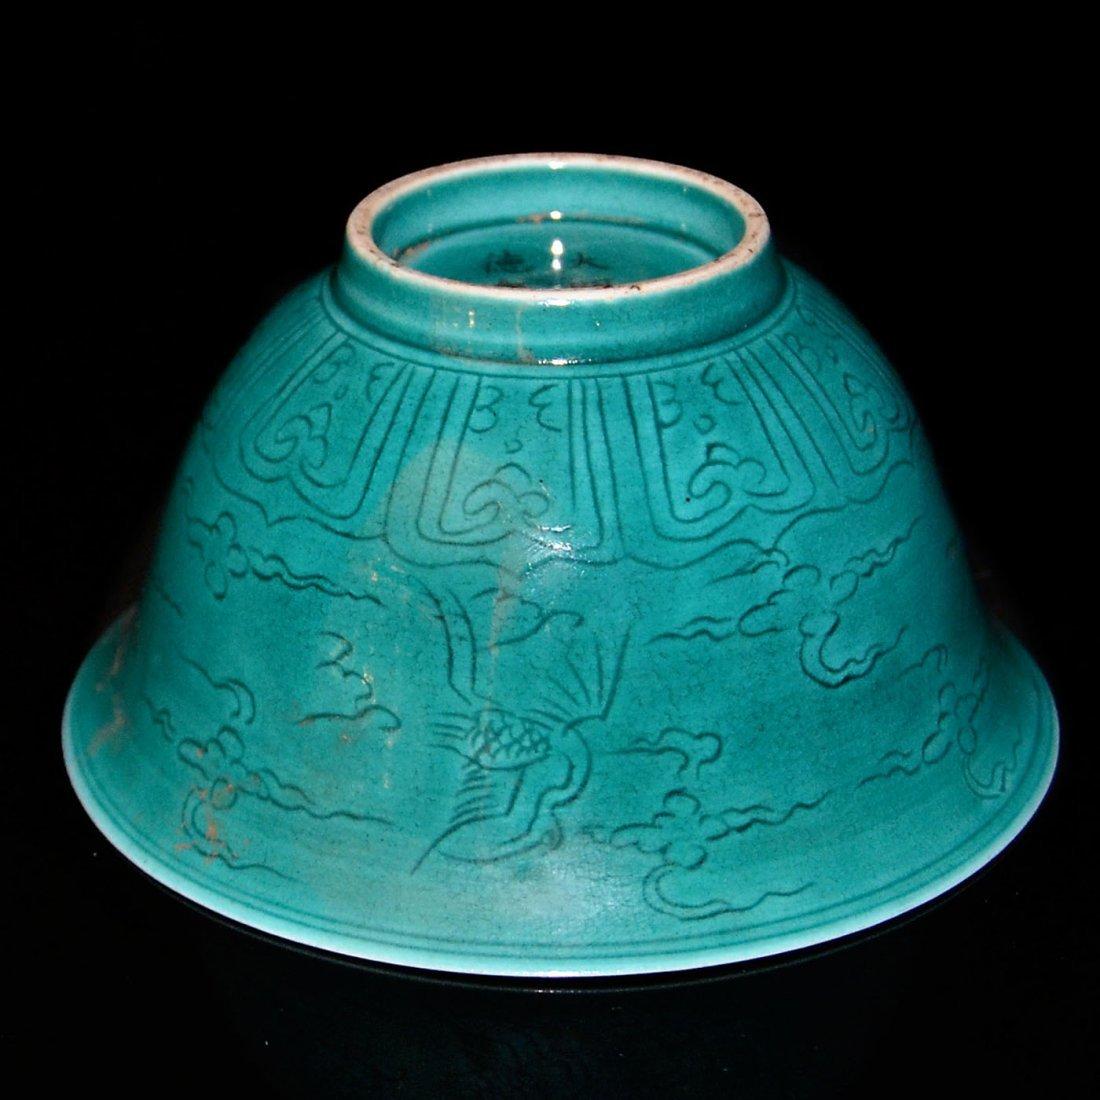 Ming, A Rare Peacock-Blue-Glazed Bowl - 4